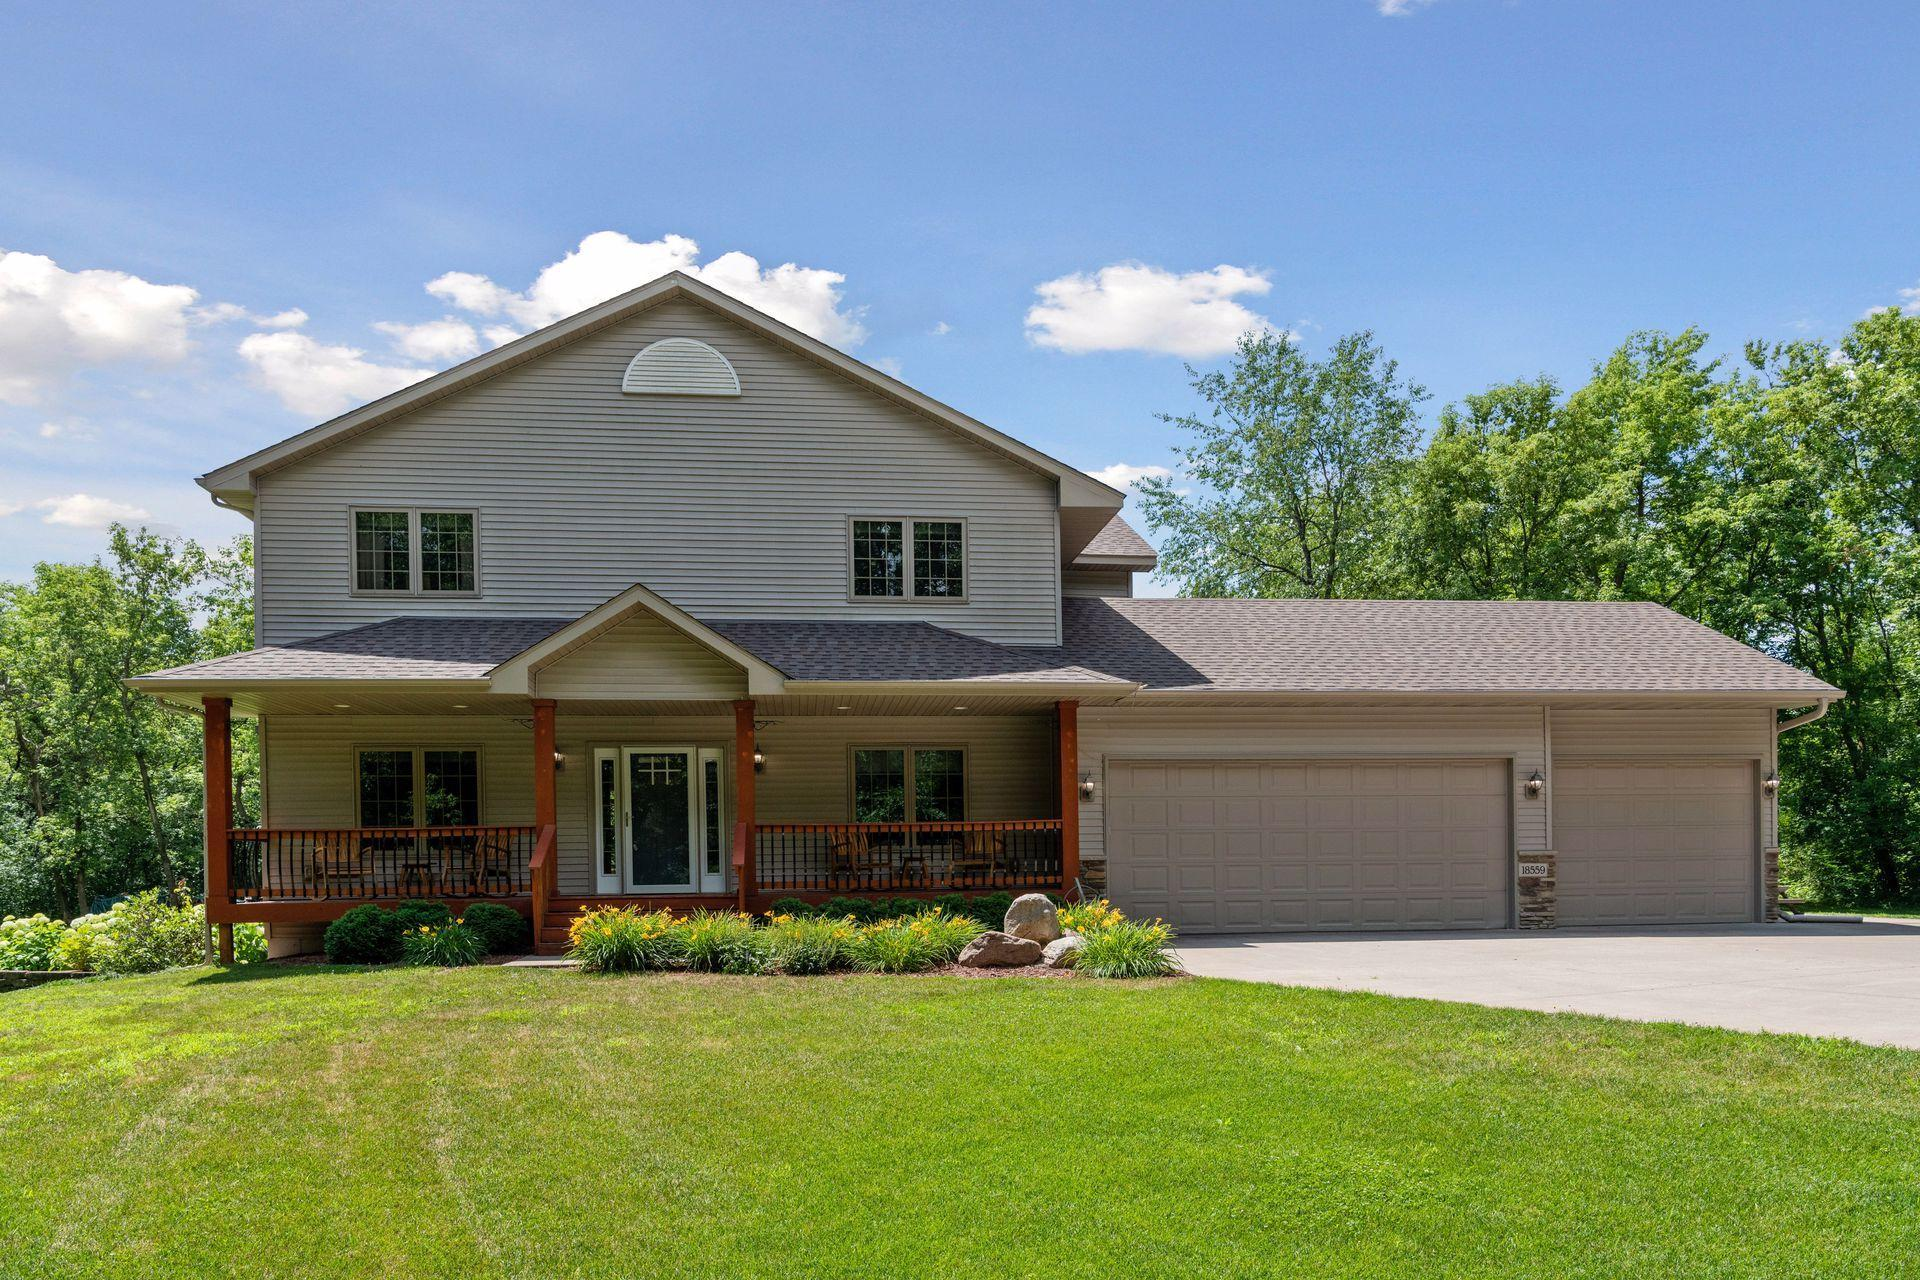 18559 243rd Avenue NW Property Photo - Big Lake, MN real estate listing